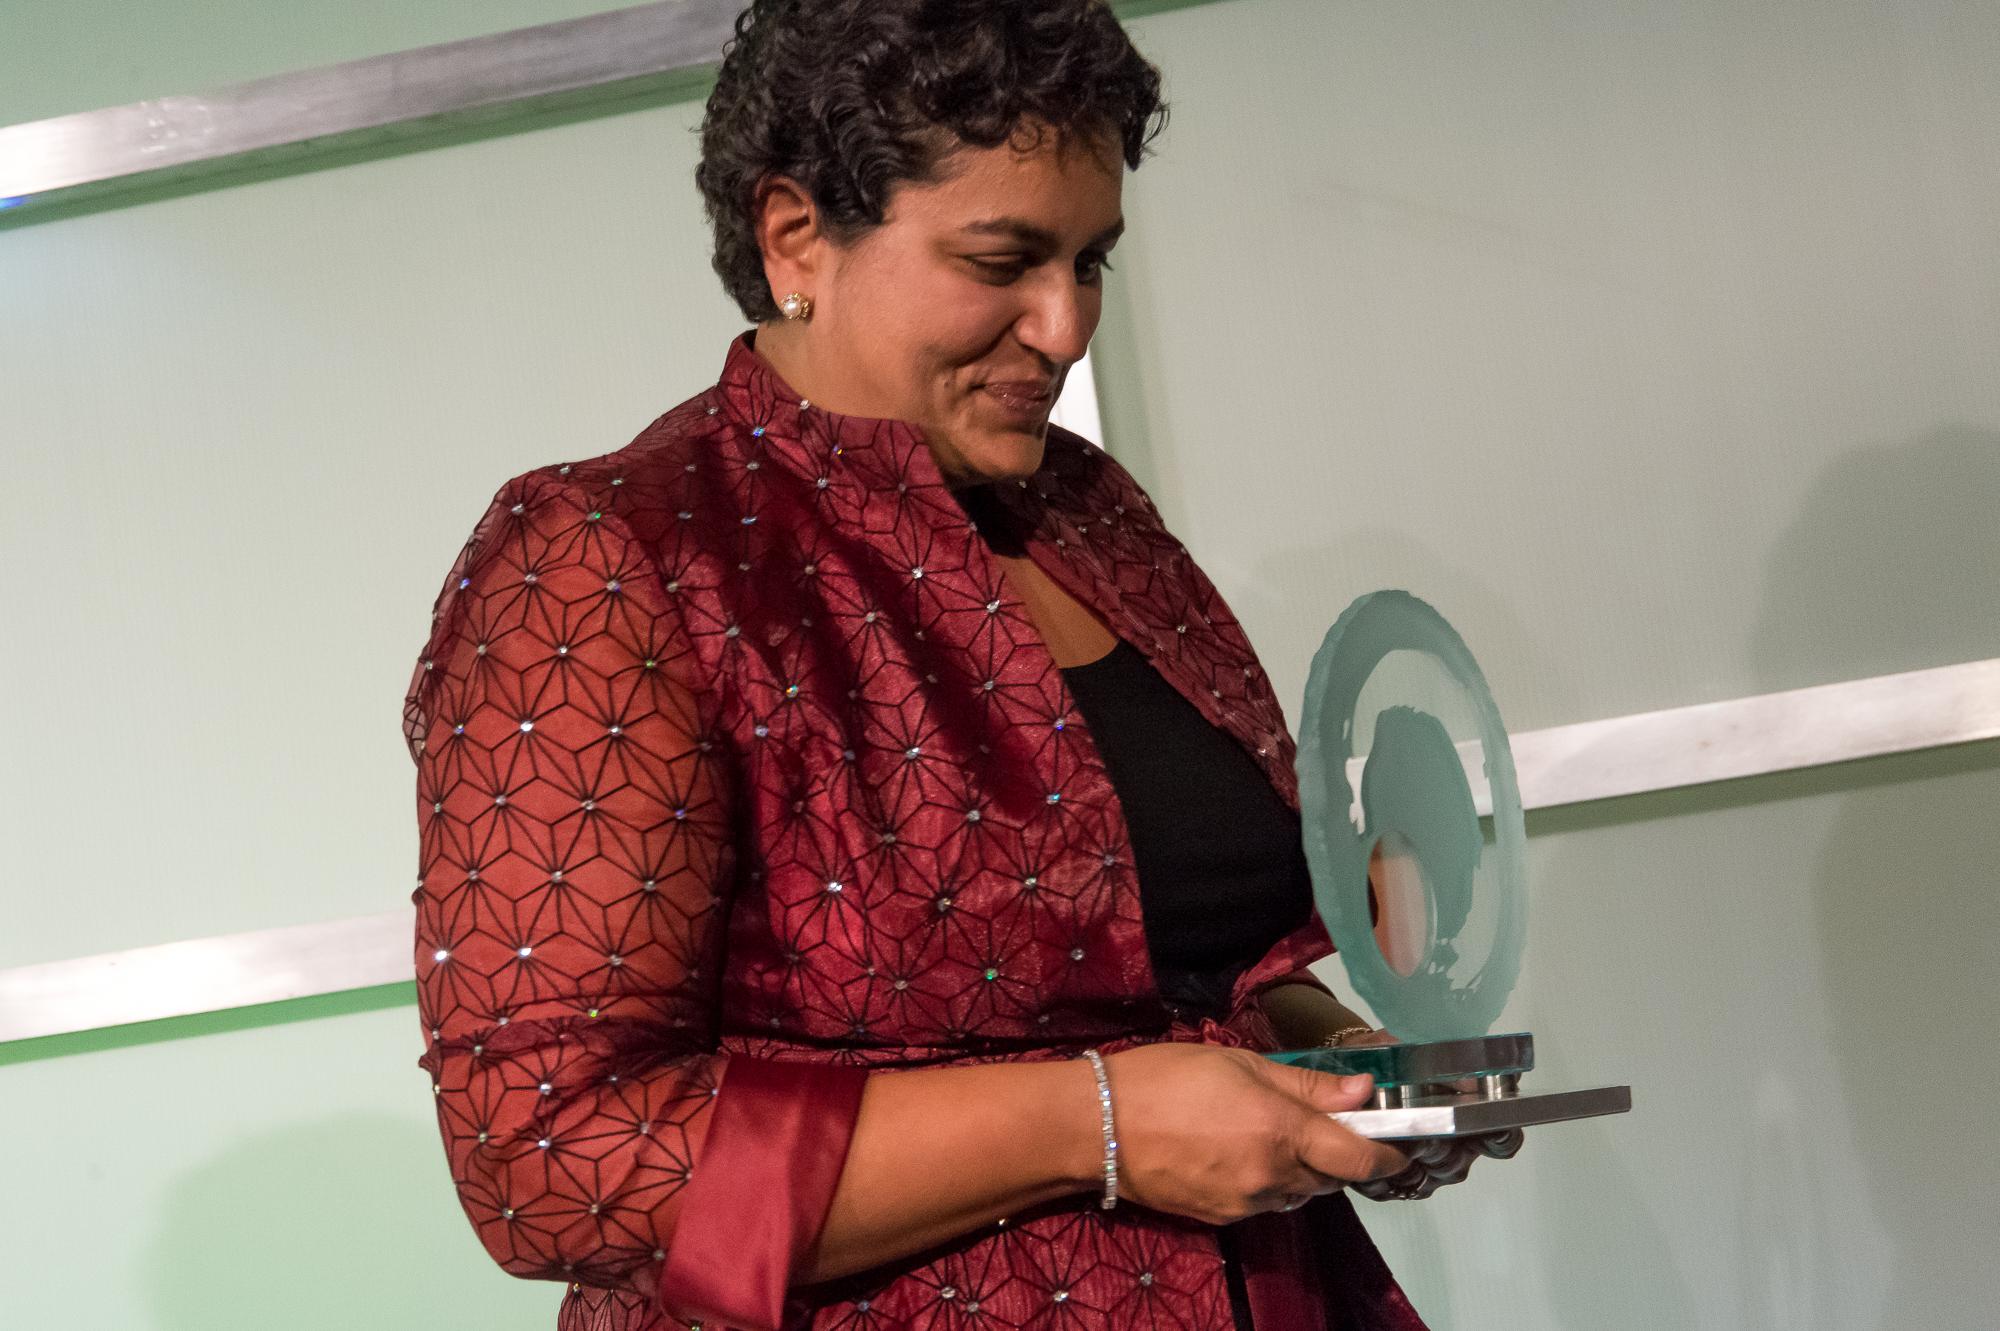 2013 Dr. Rogers Prize Winner Dr. Sunita Vohra